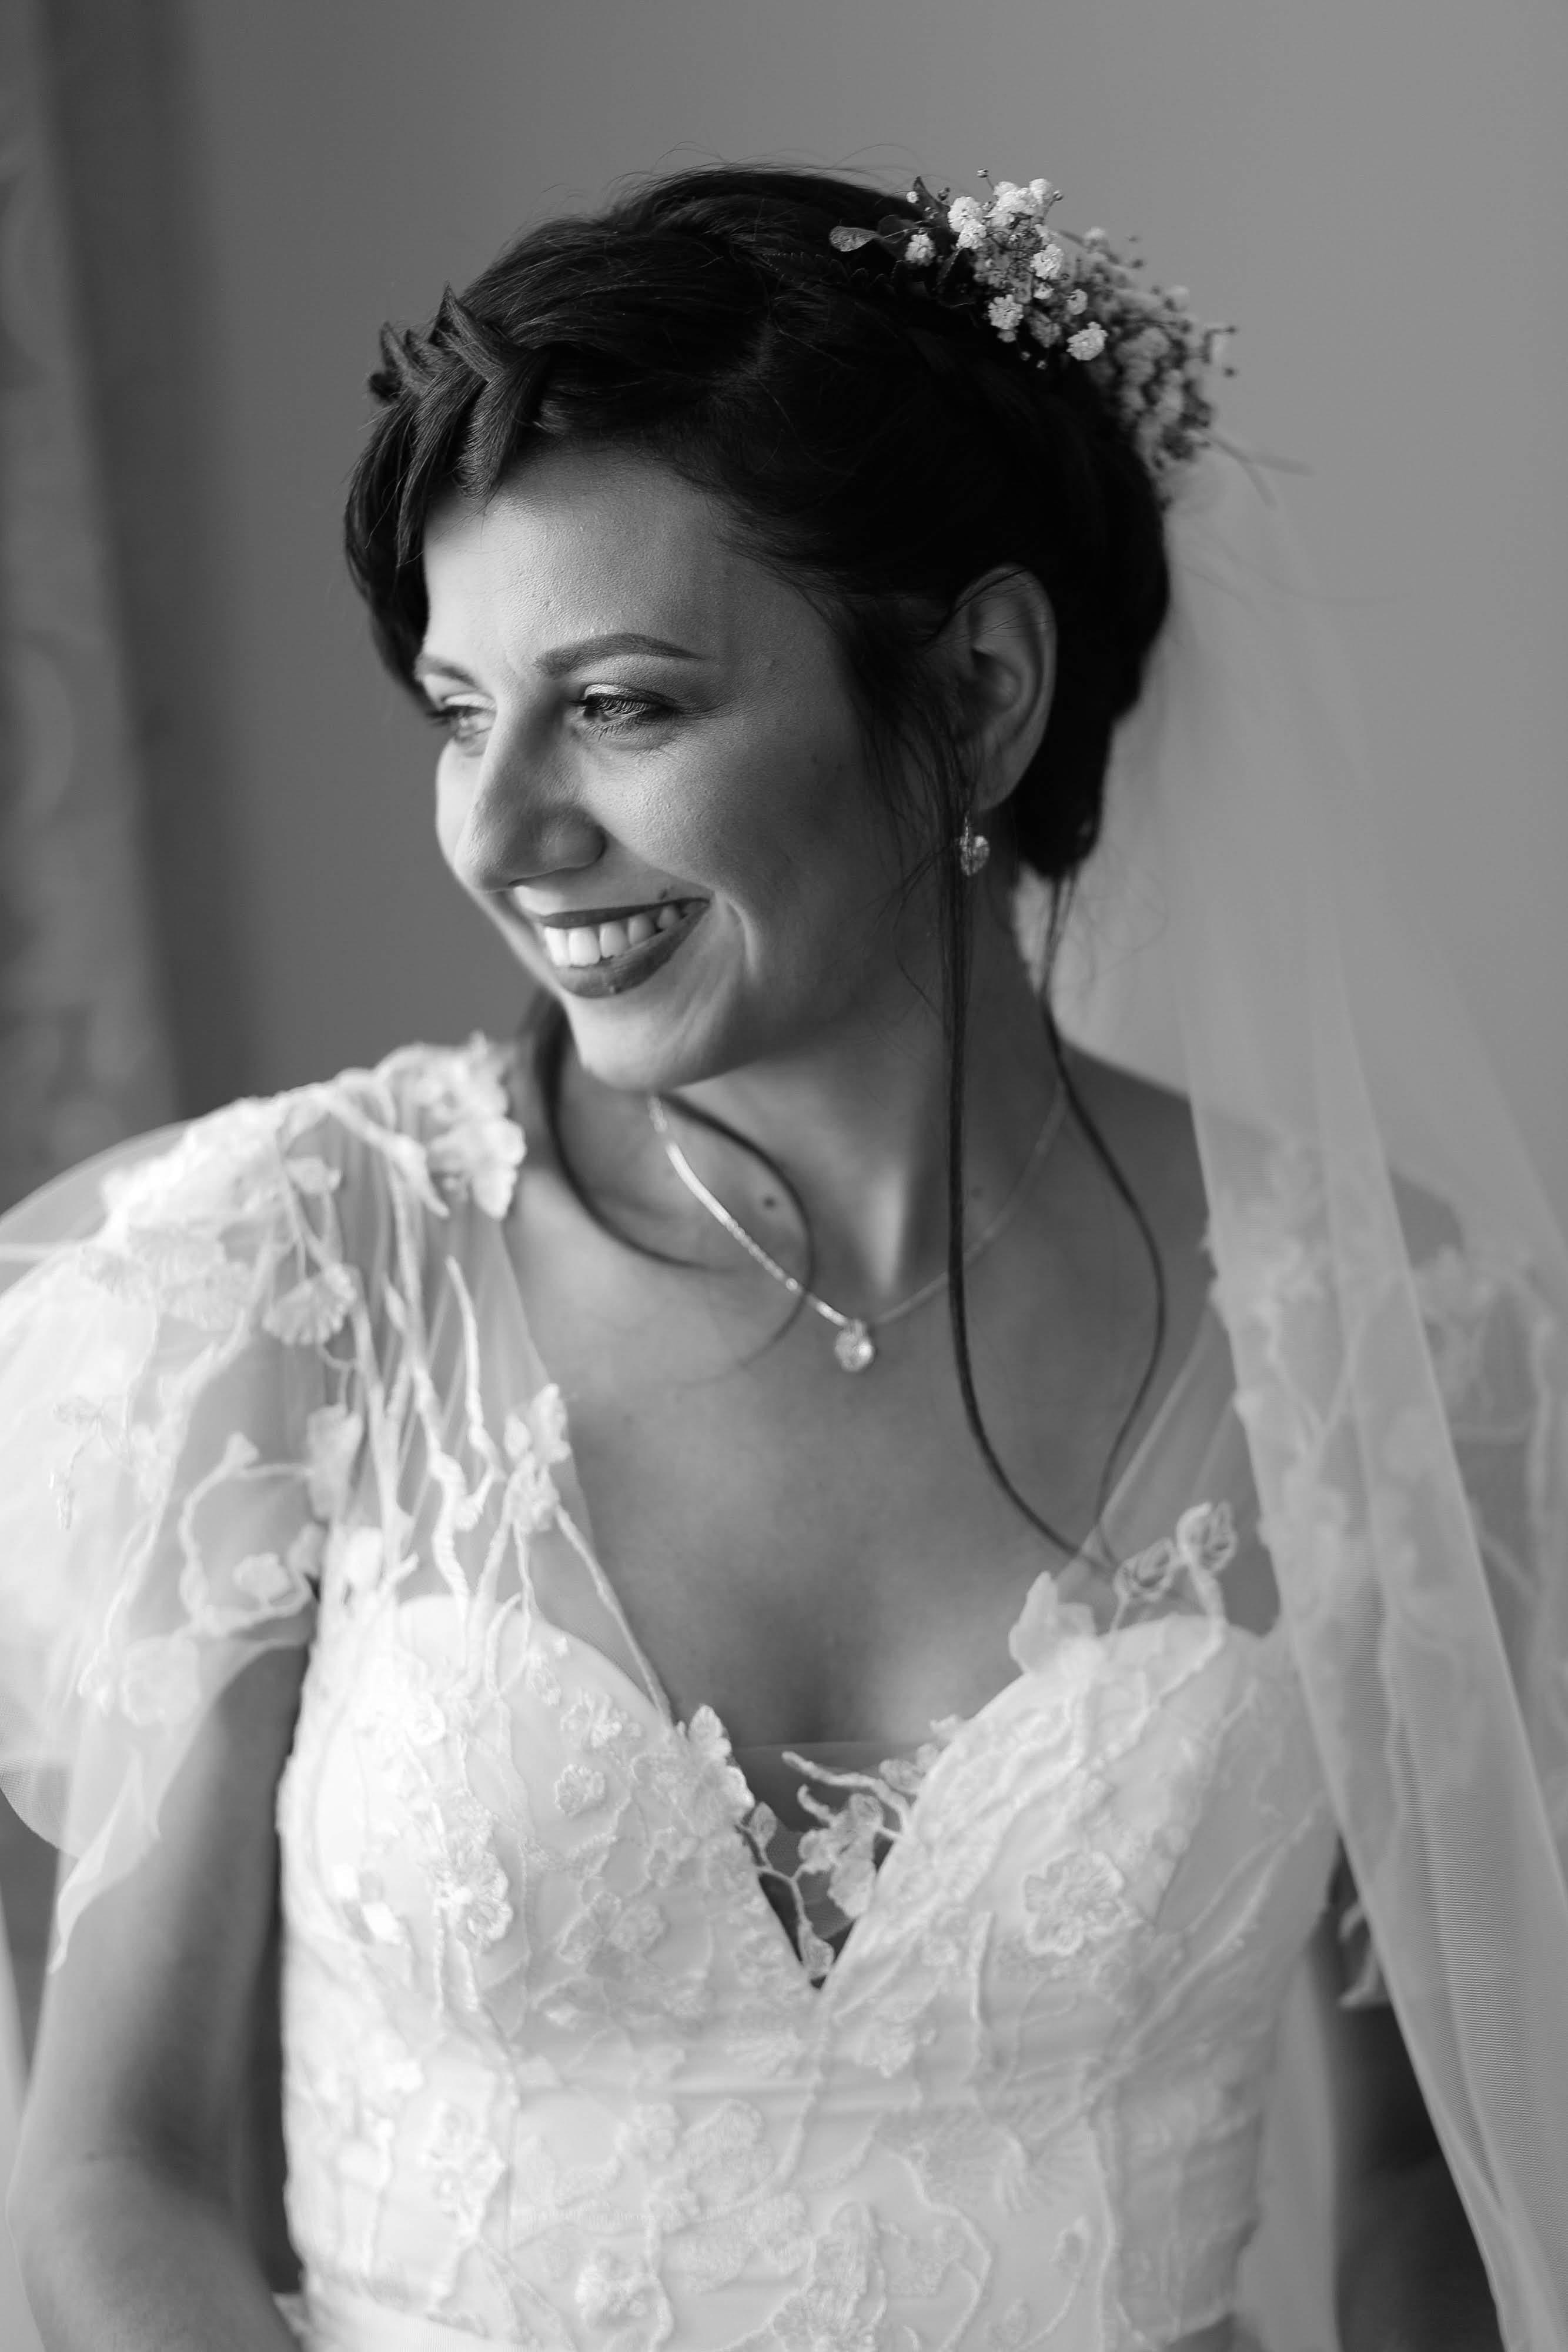 Monochrome Photo of Woman Wearing White Dress